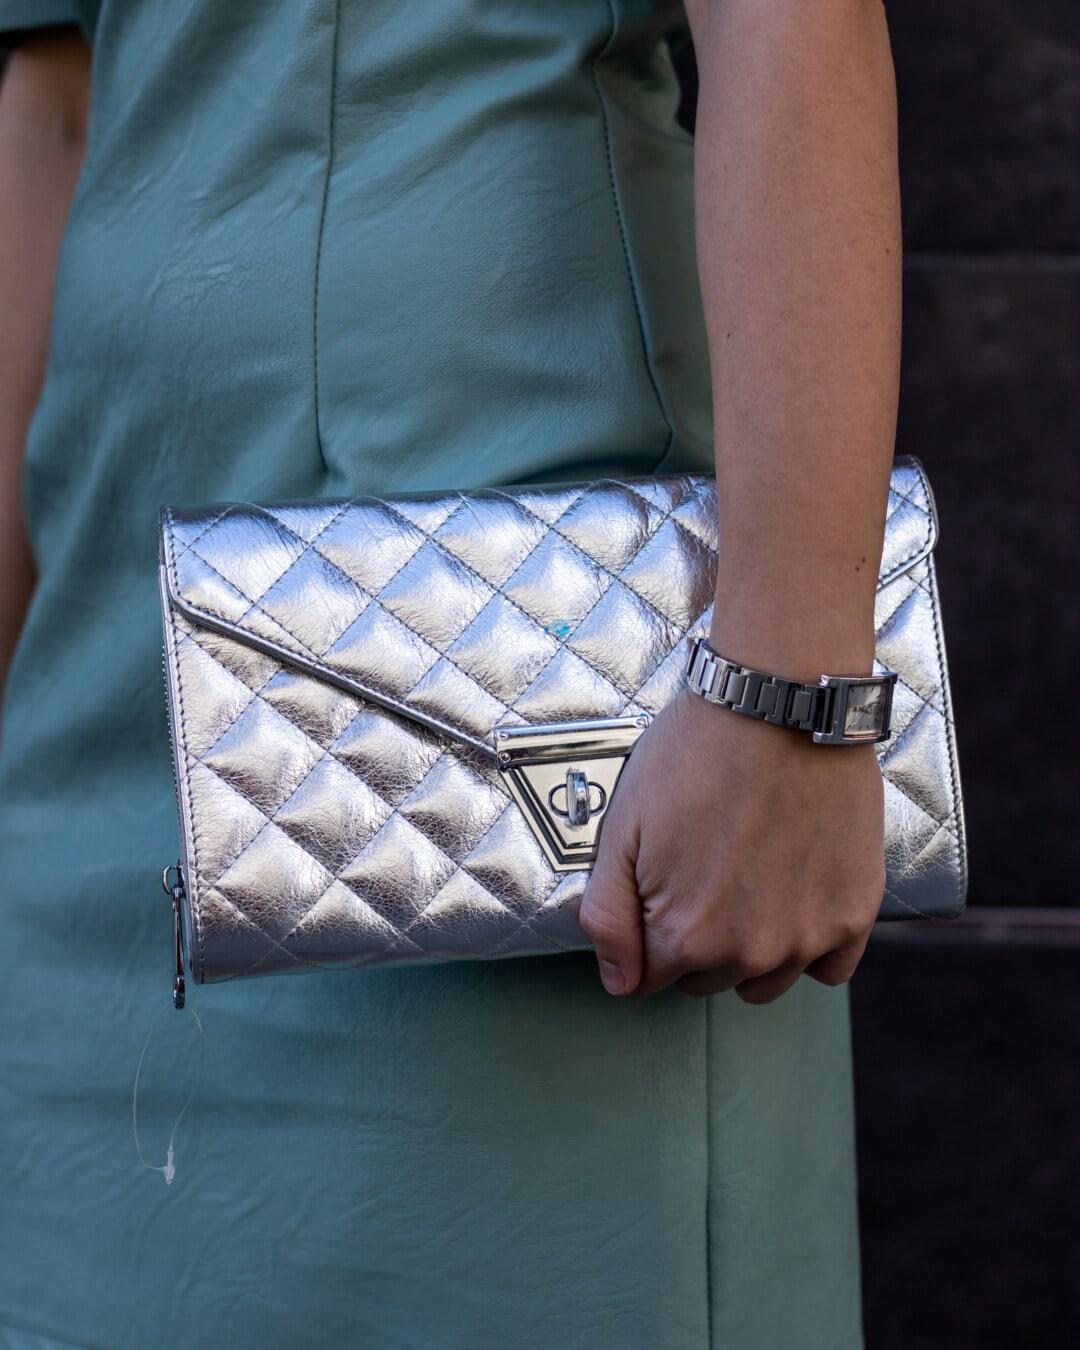 блестящ, чанта, сив, рокля, мода, кожа, скъпо, ръчен часовник, сребро, жена